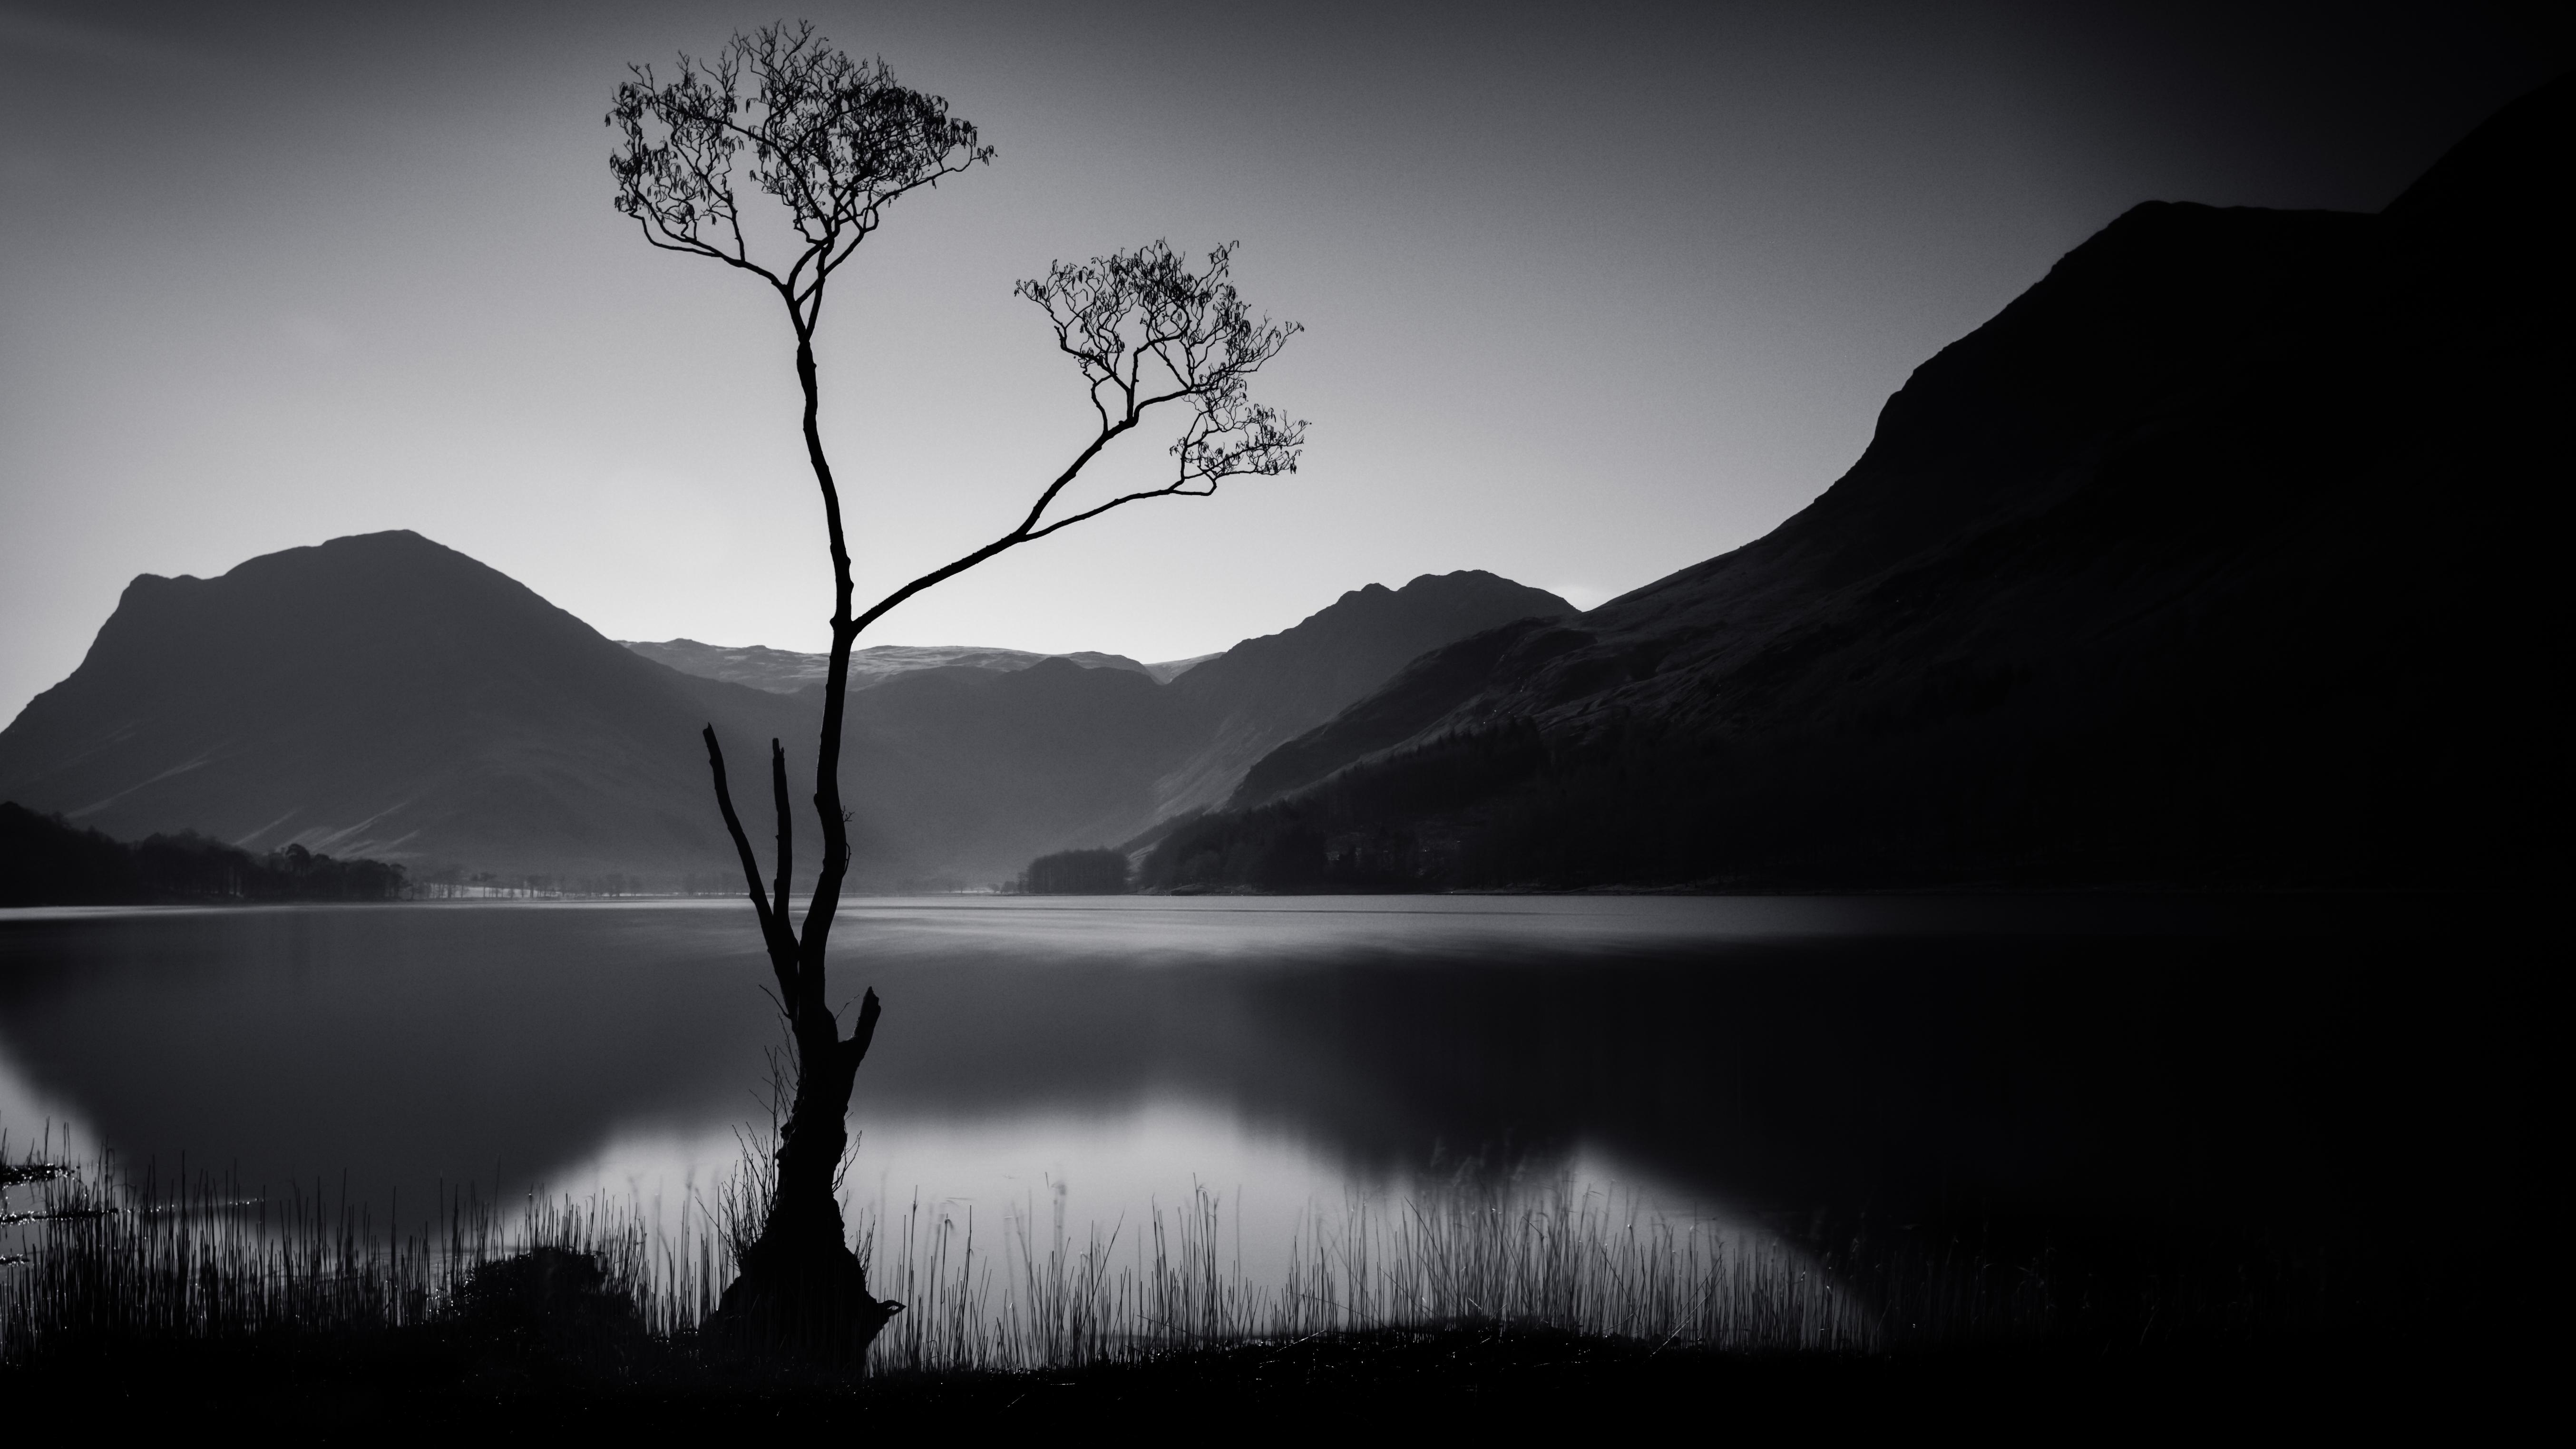 хвалят черно белые картинки на телефон природа представлена одна